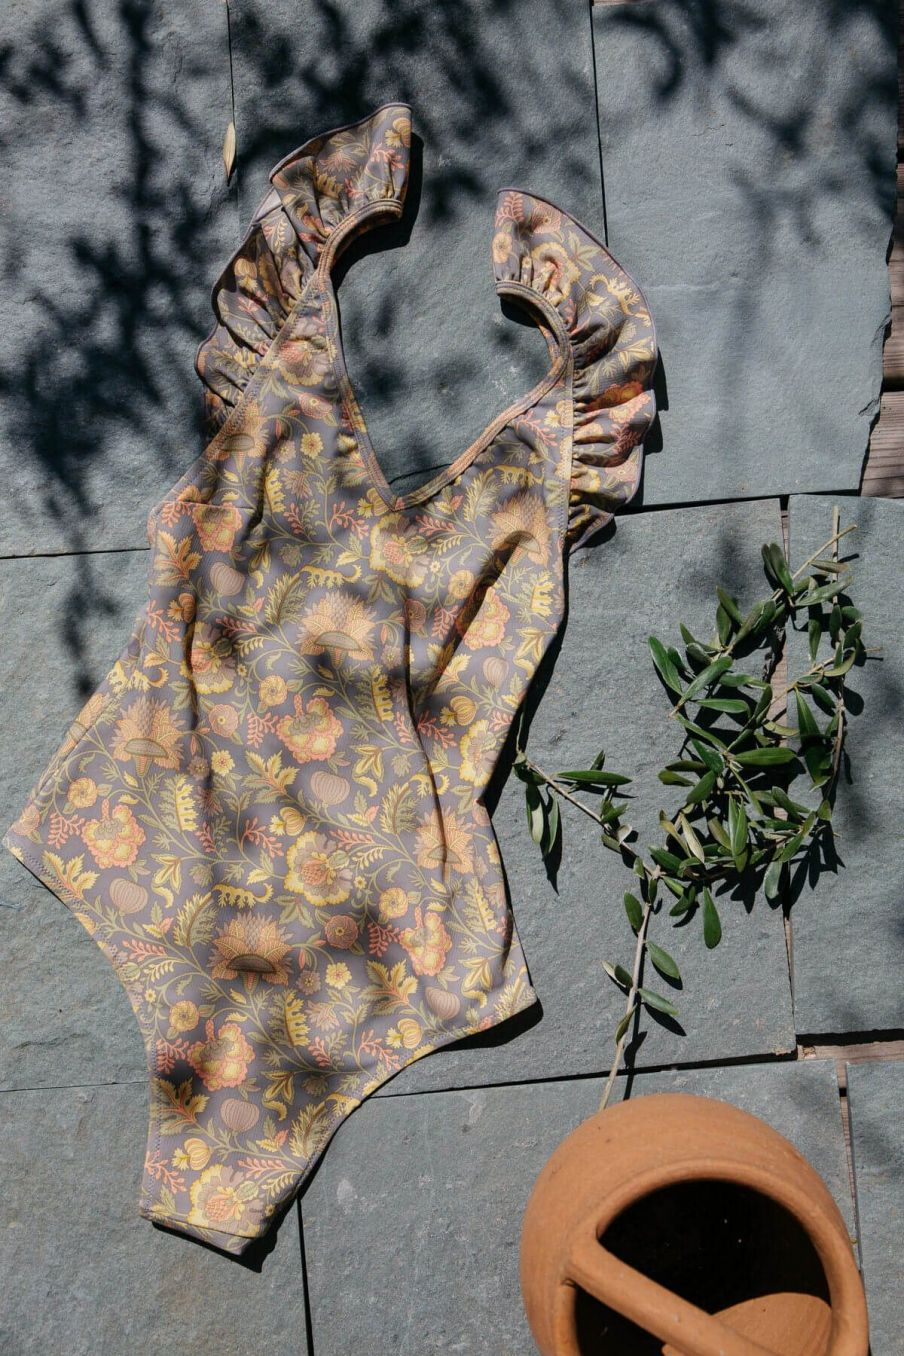 boheme chic vintage maillot de bain femme reva grey california flowers